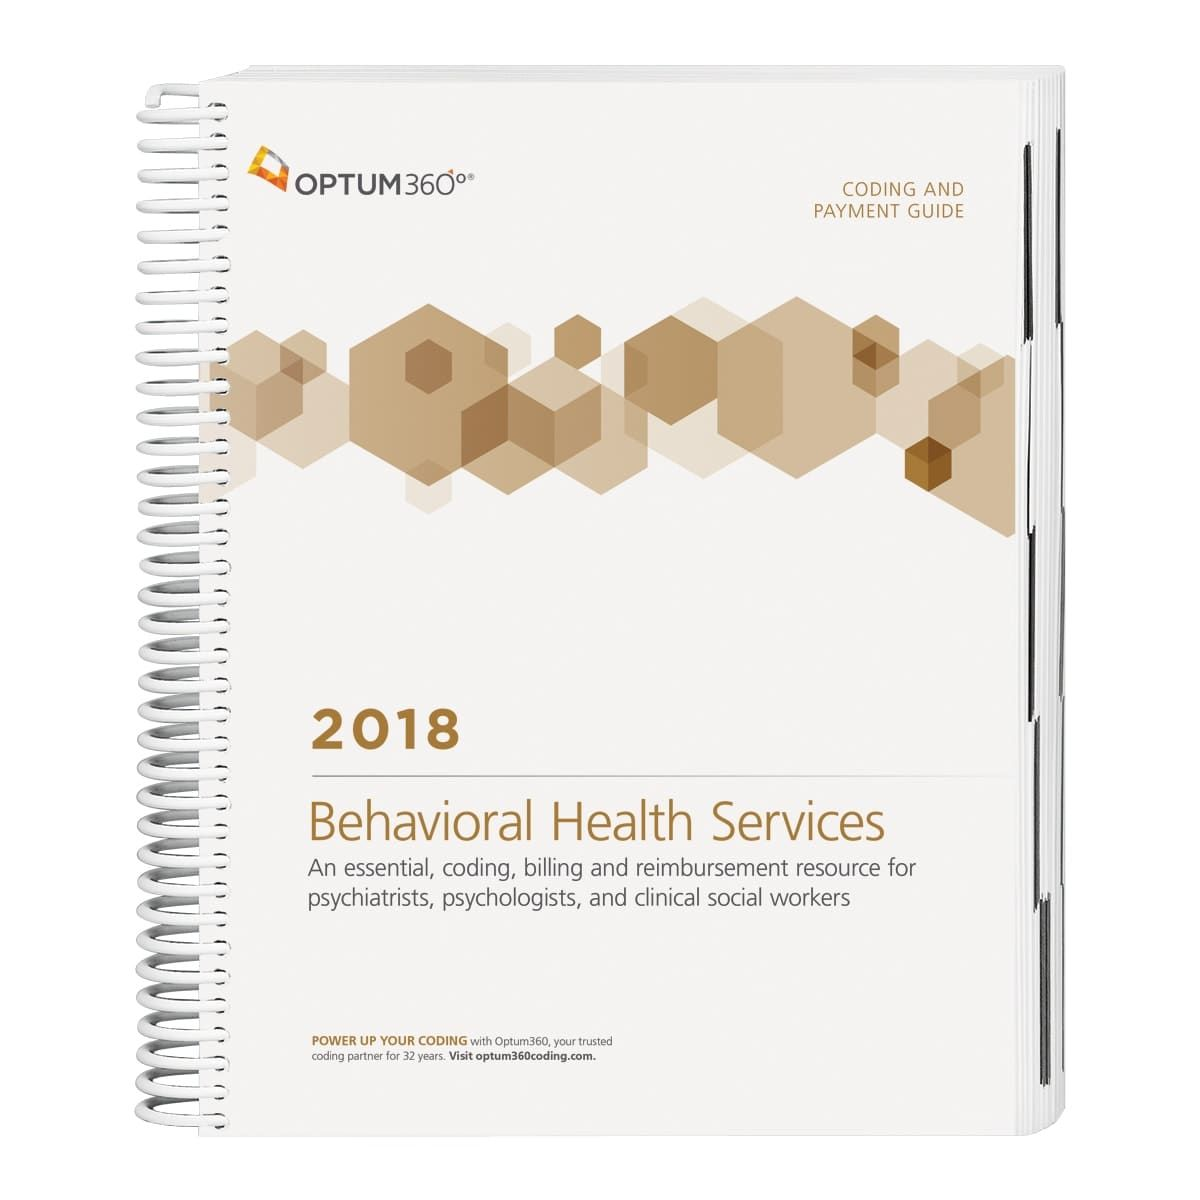 icd-10 codes mental health pdf 2020